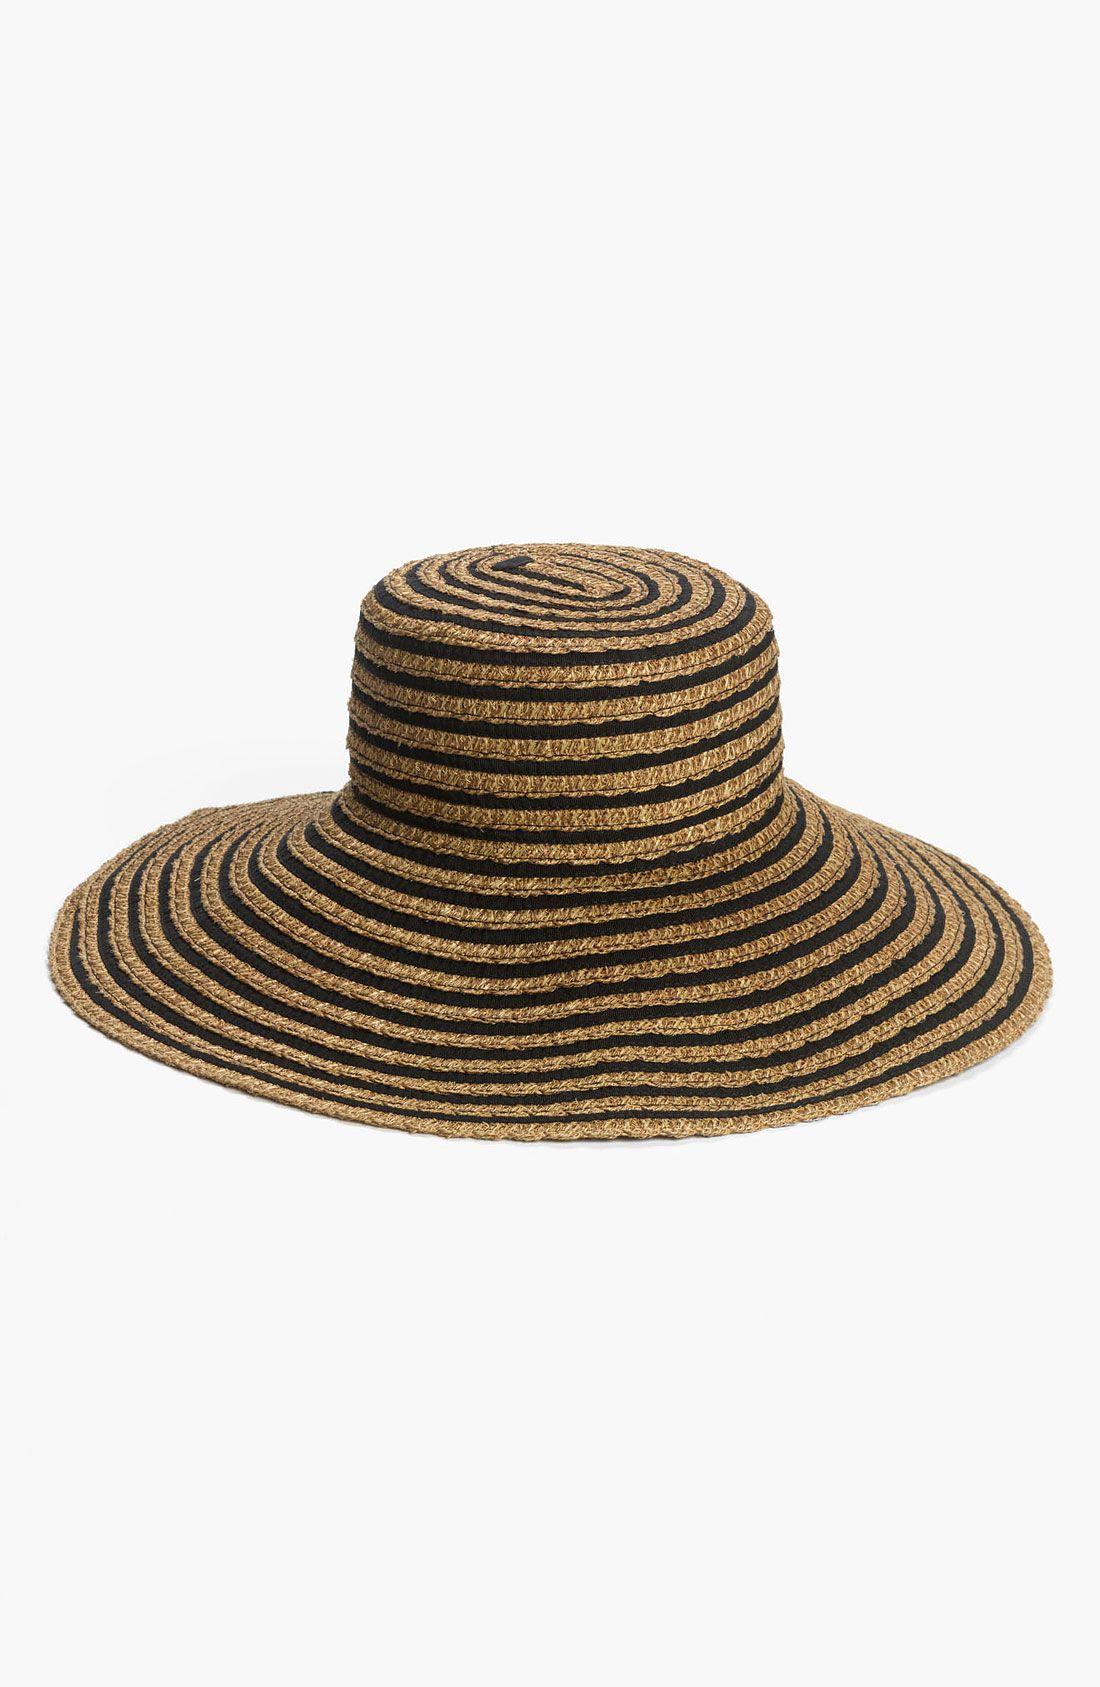 9abeb653e7361 Eric Javits  GG Dame II  Packable Sun Hat